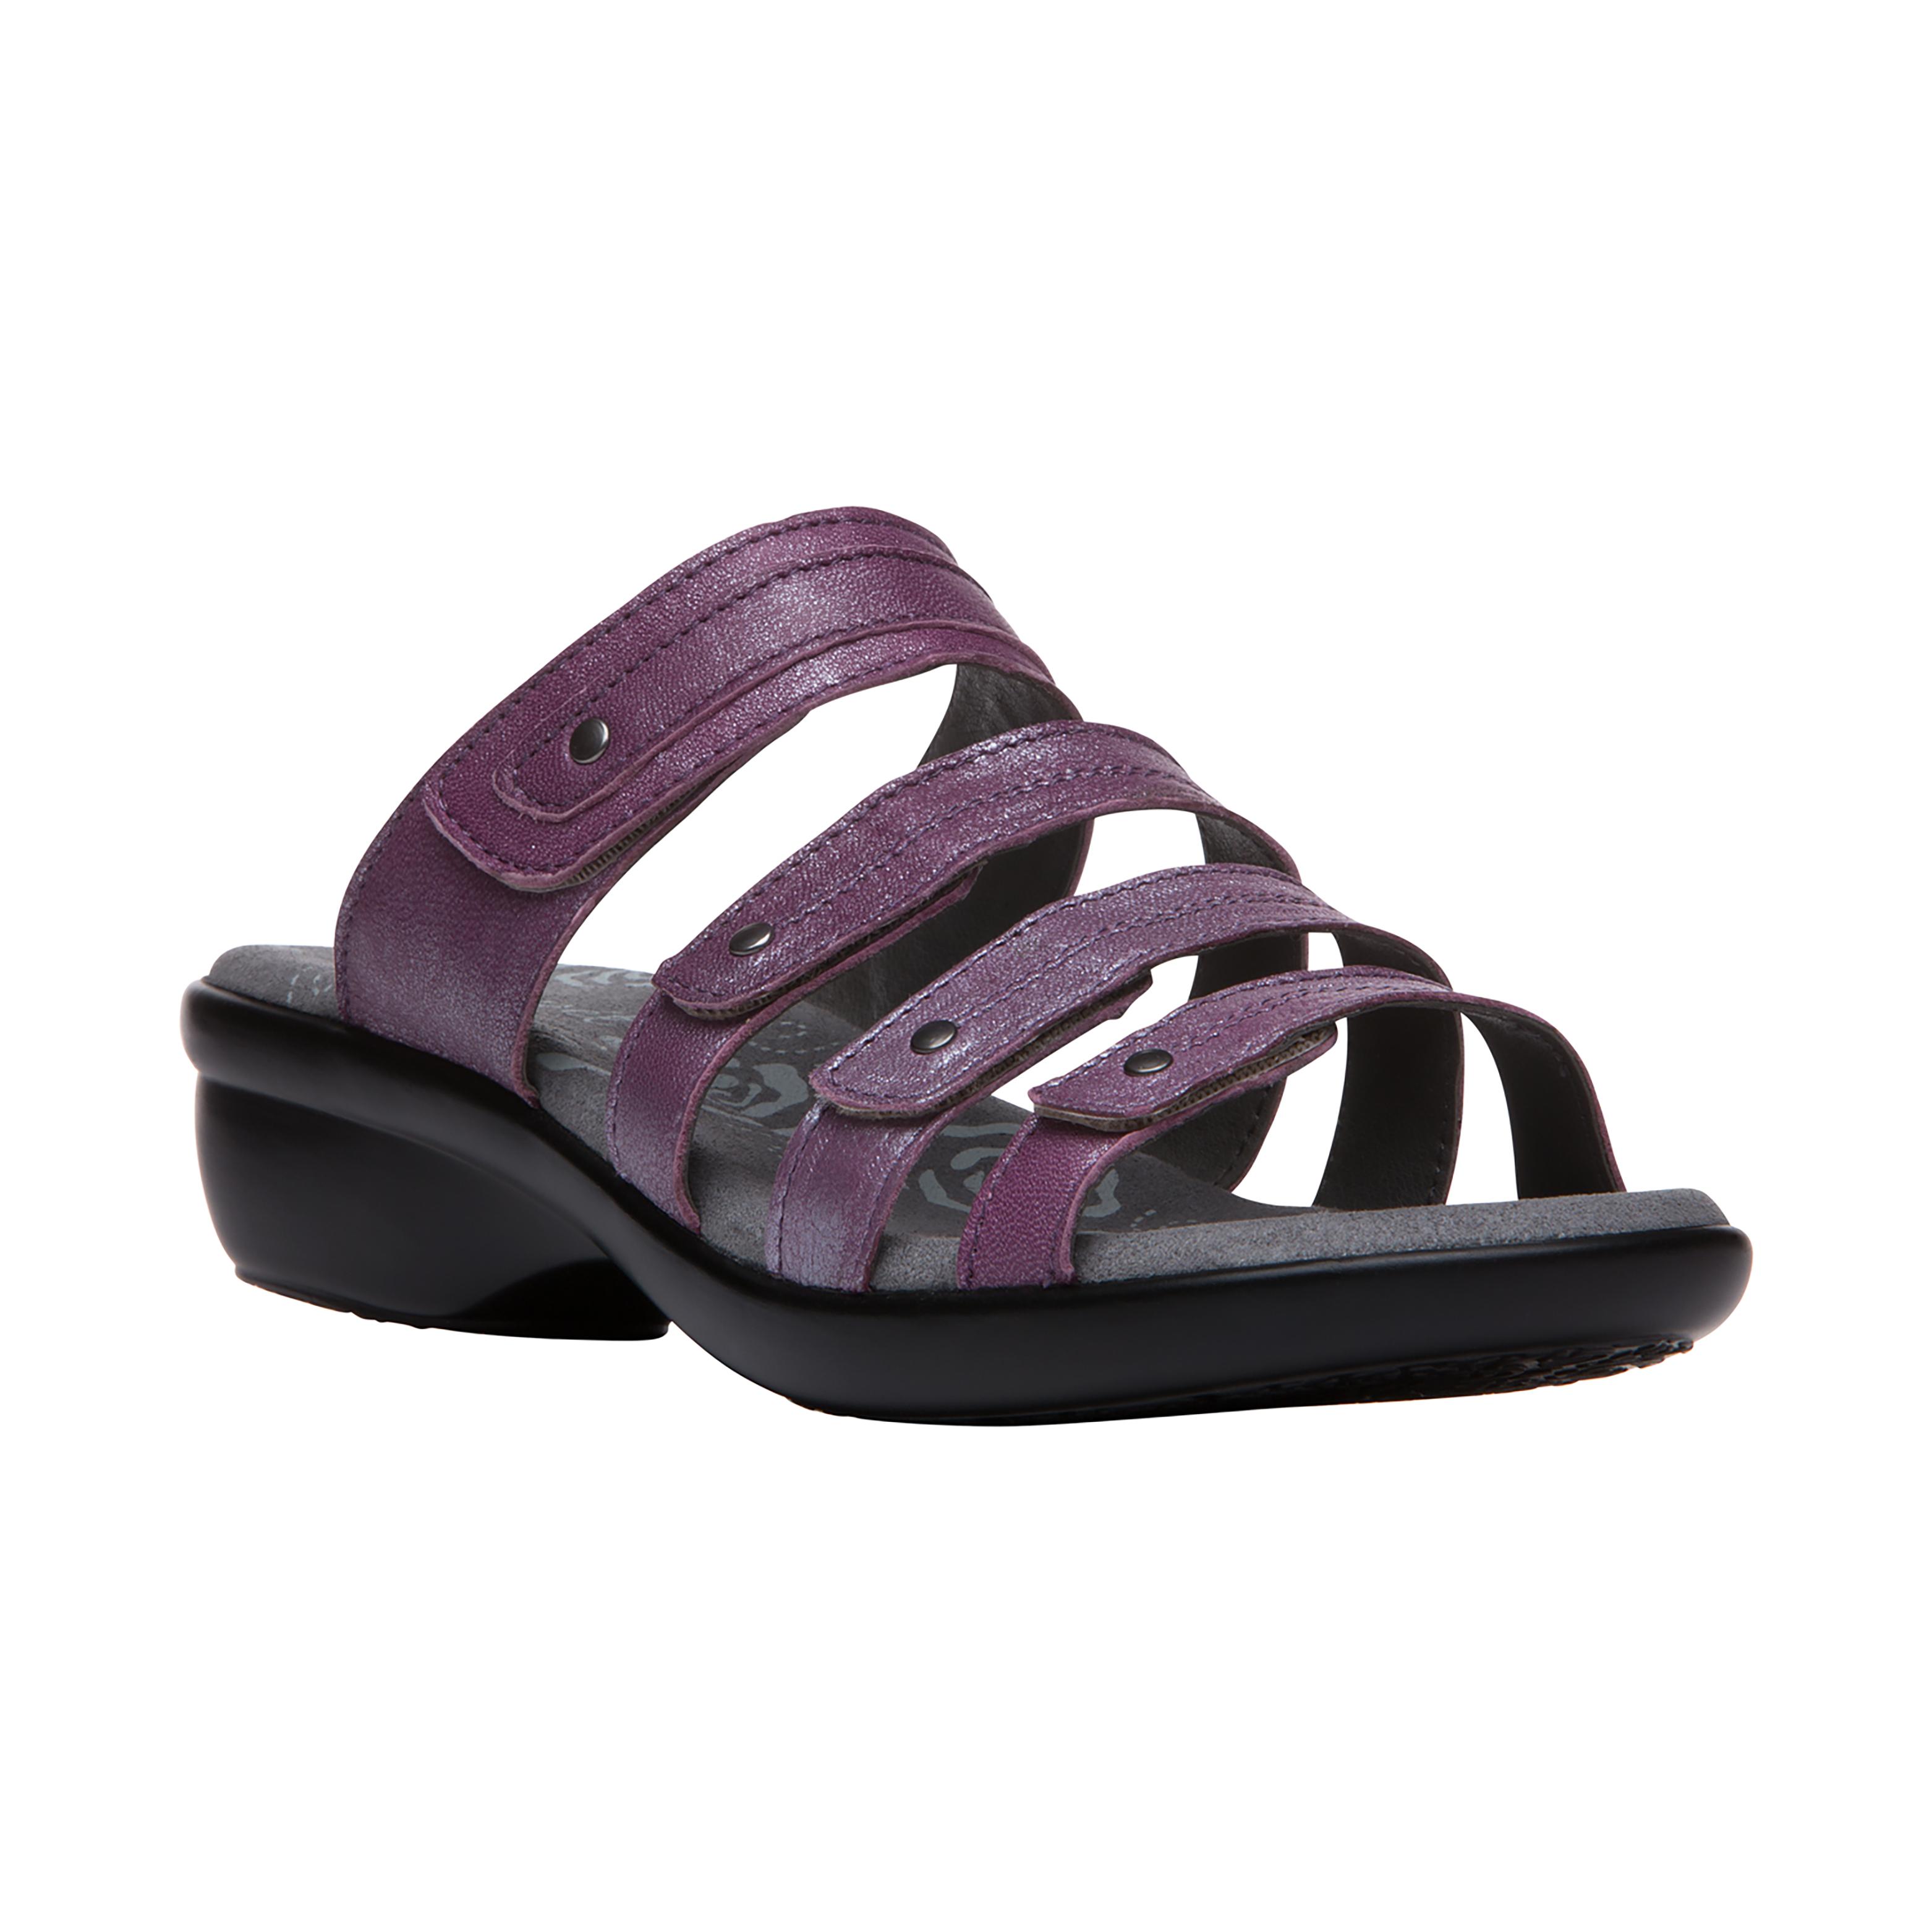 97c06ee9582 Propet   Womens Propet Aurora Slide Sandal Ruby